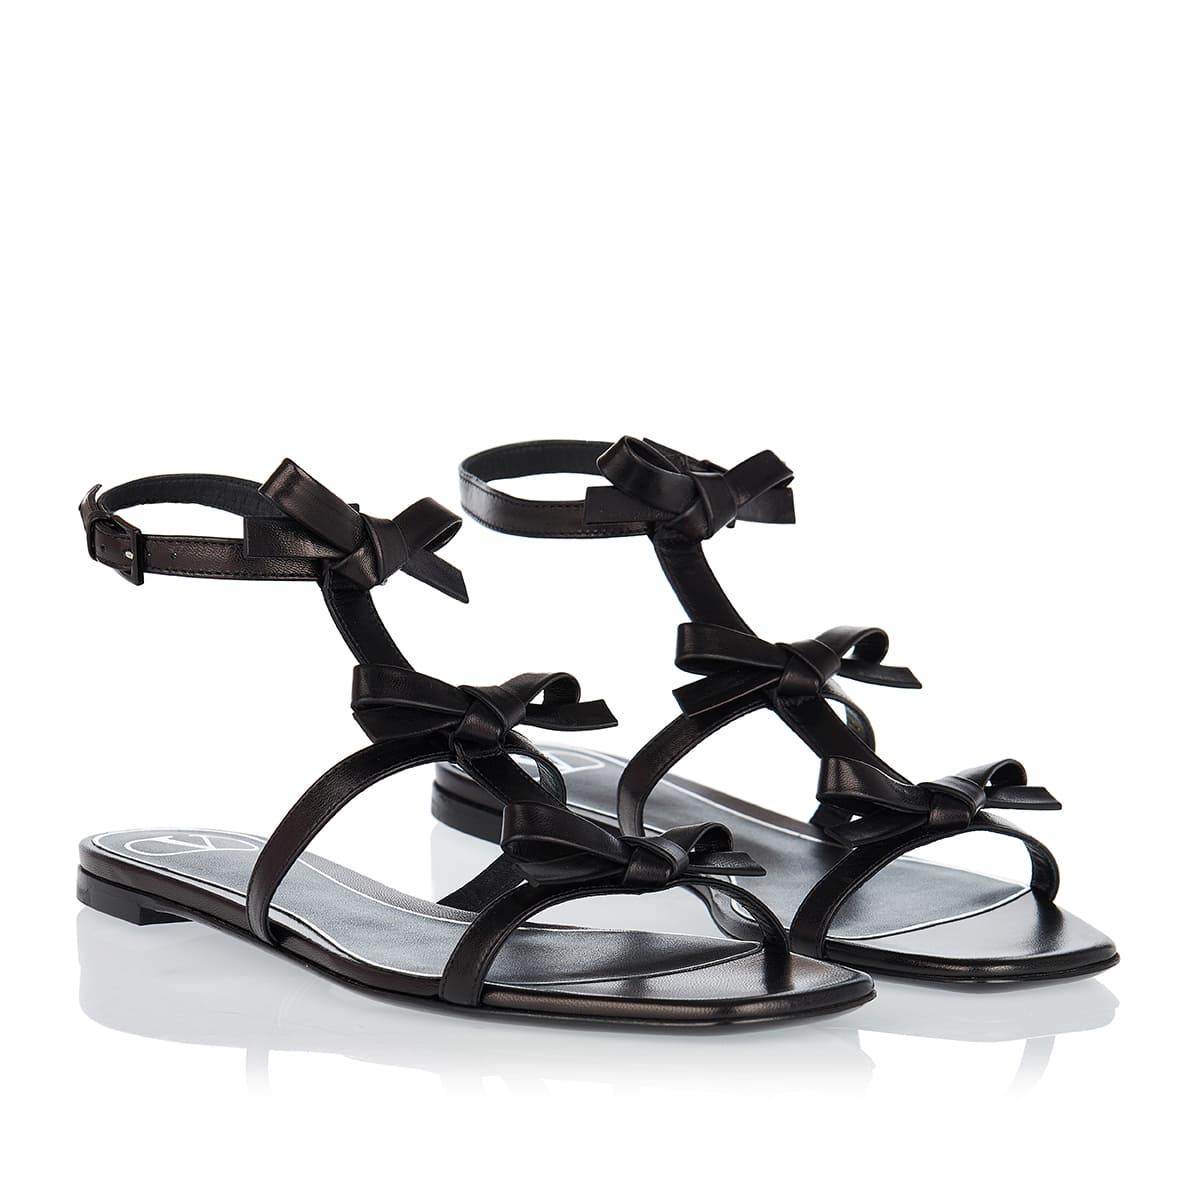 Bow-embellished leather flat sandals